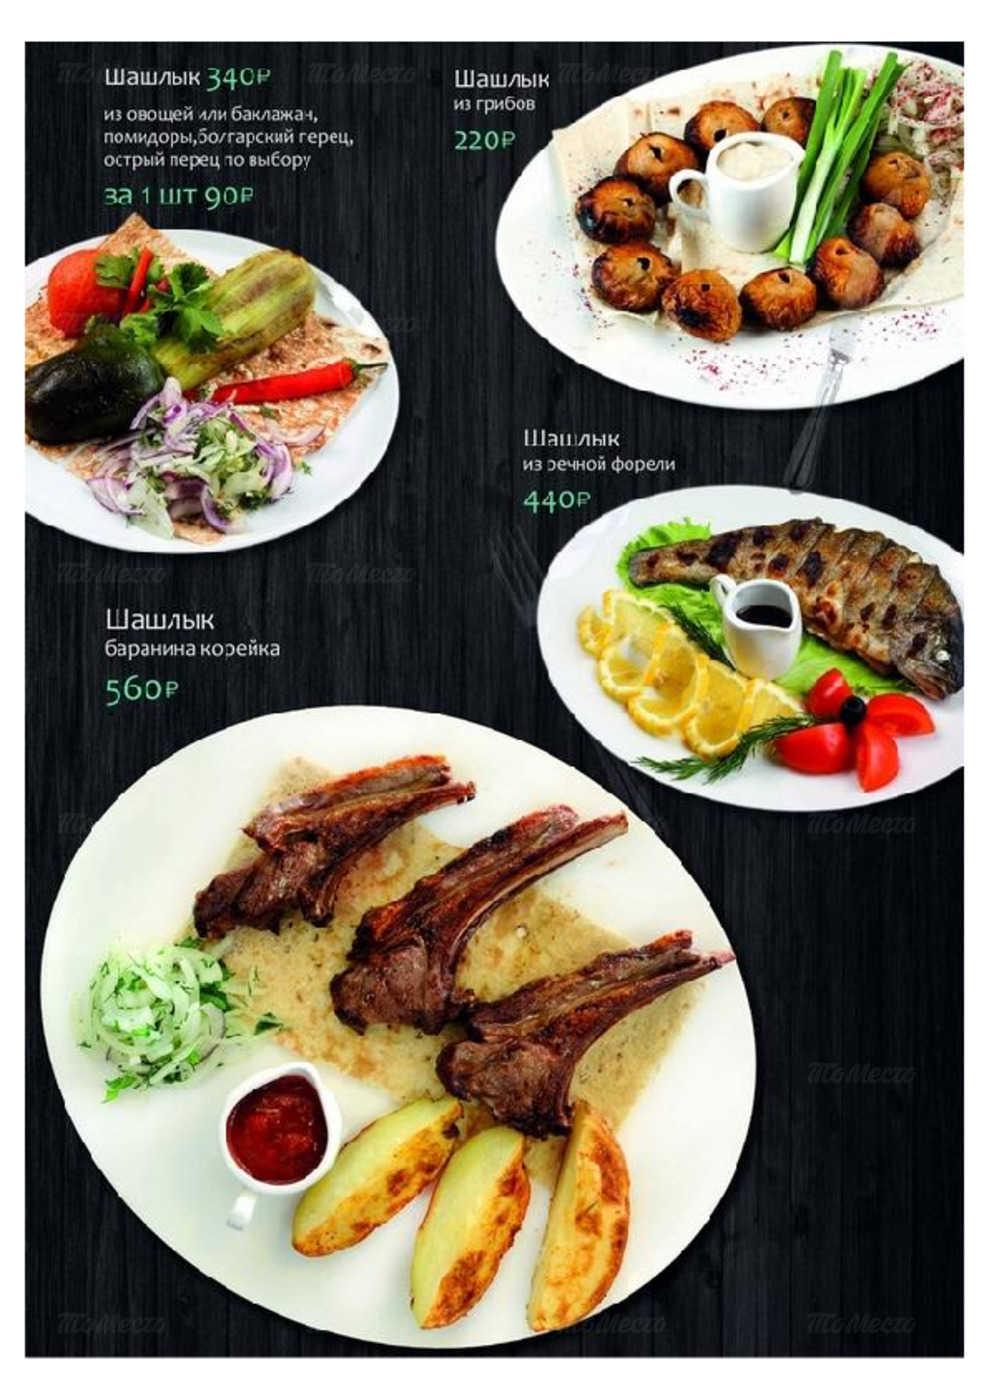 Меню ресторана Любимый Хабиб на проспекте Стачек фото 32